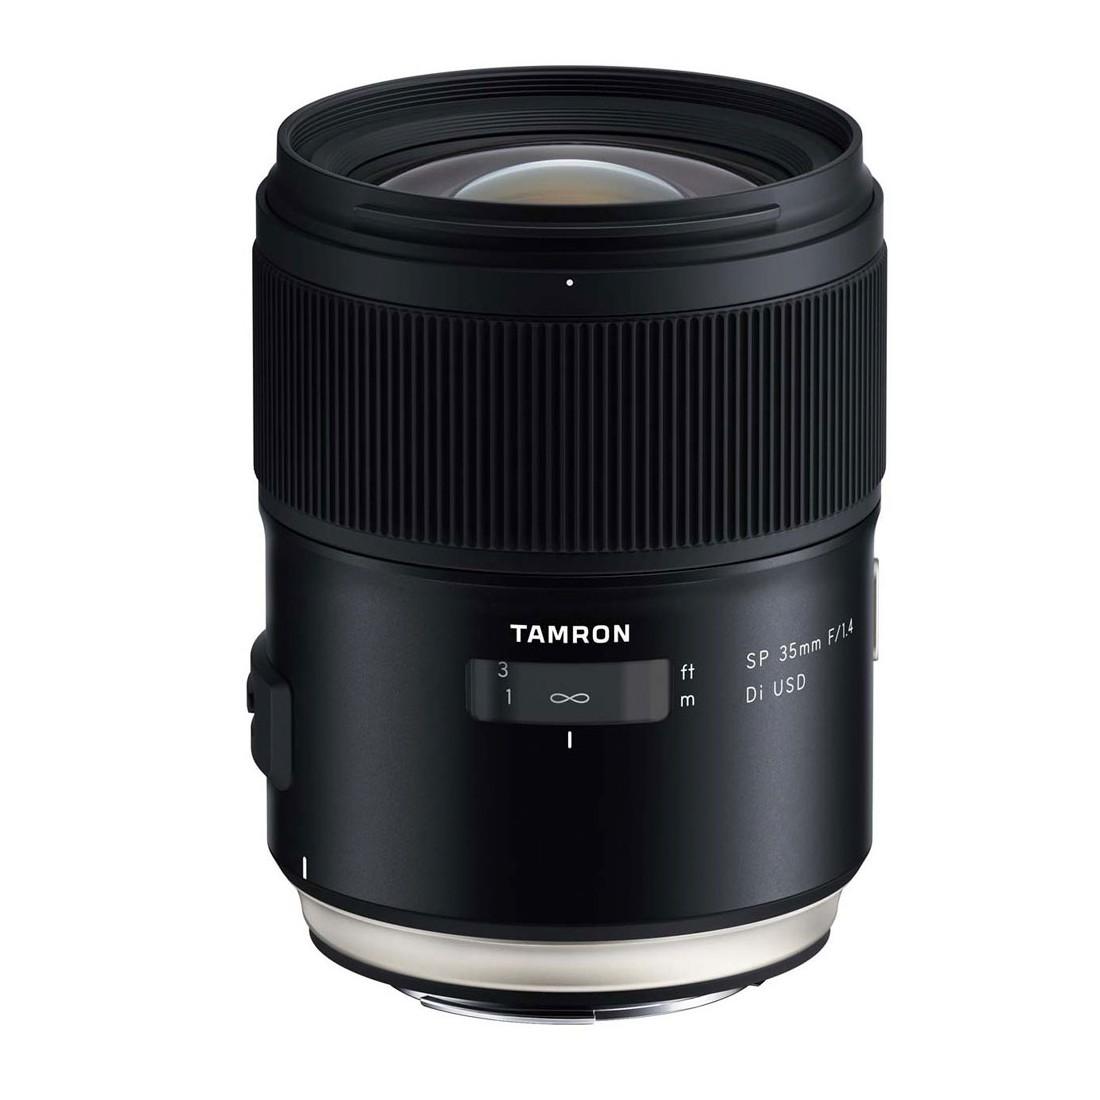 Tamron SP 35 mm F/1.4 Di USD